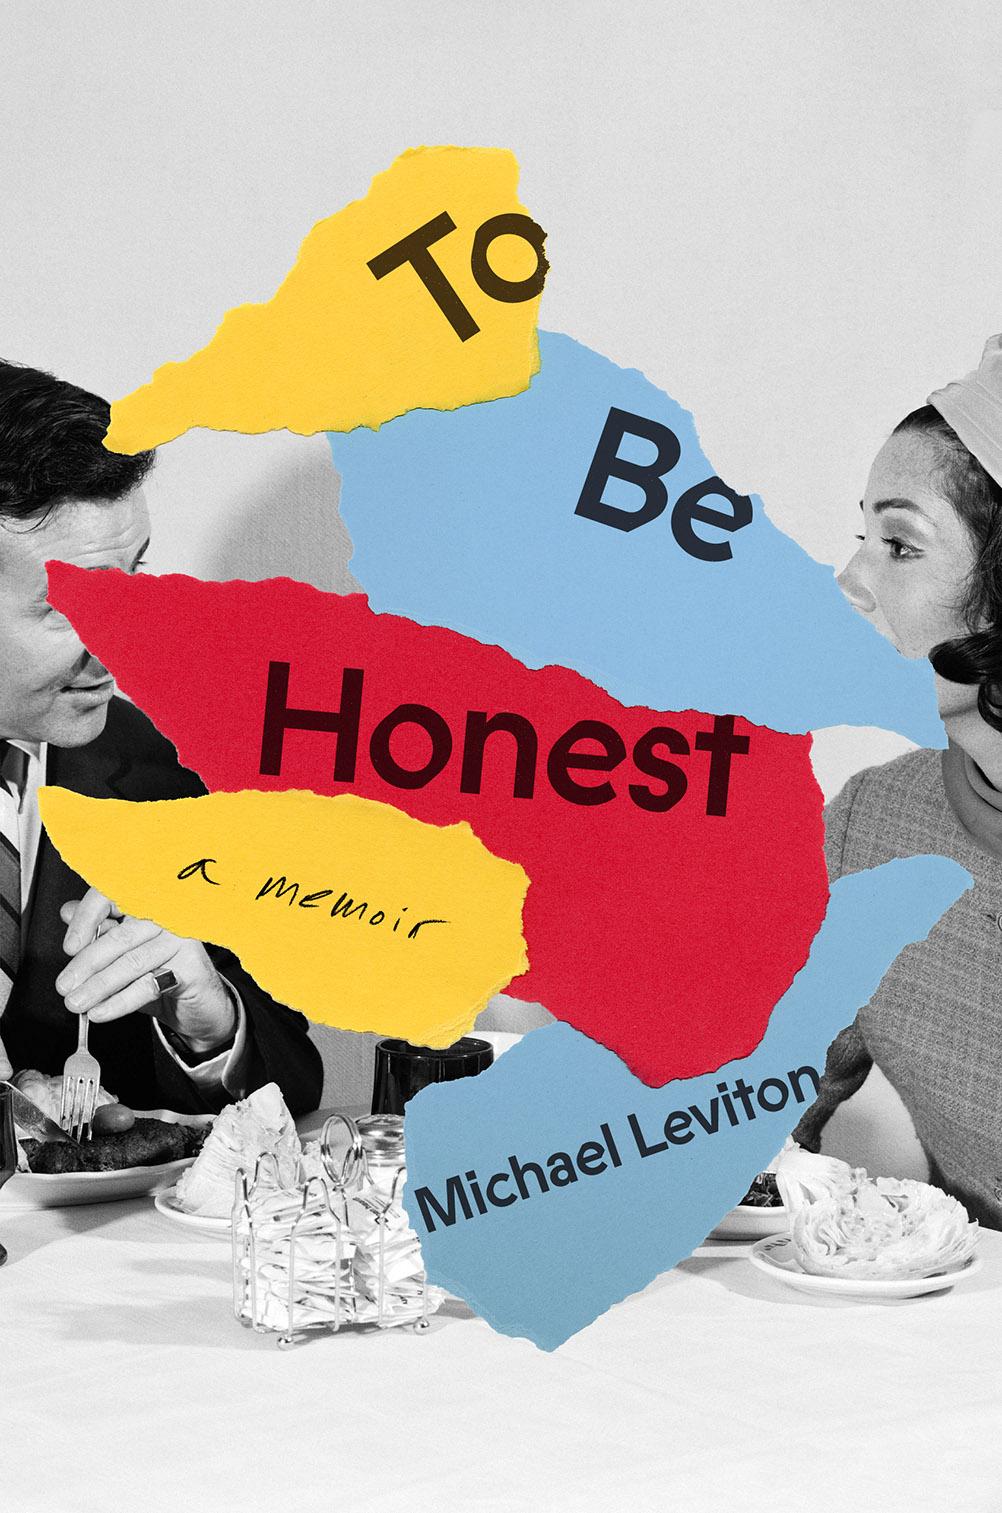 to be honest_michael leviton